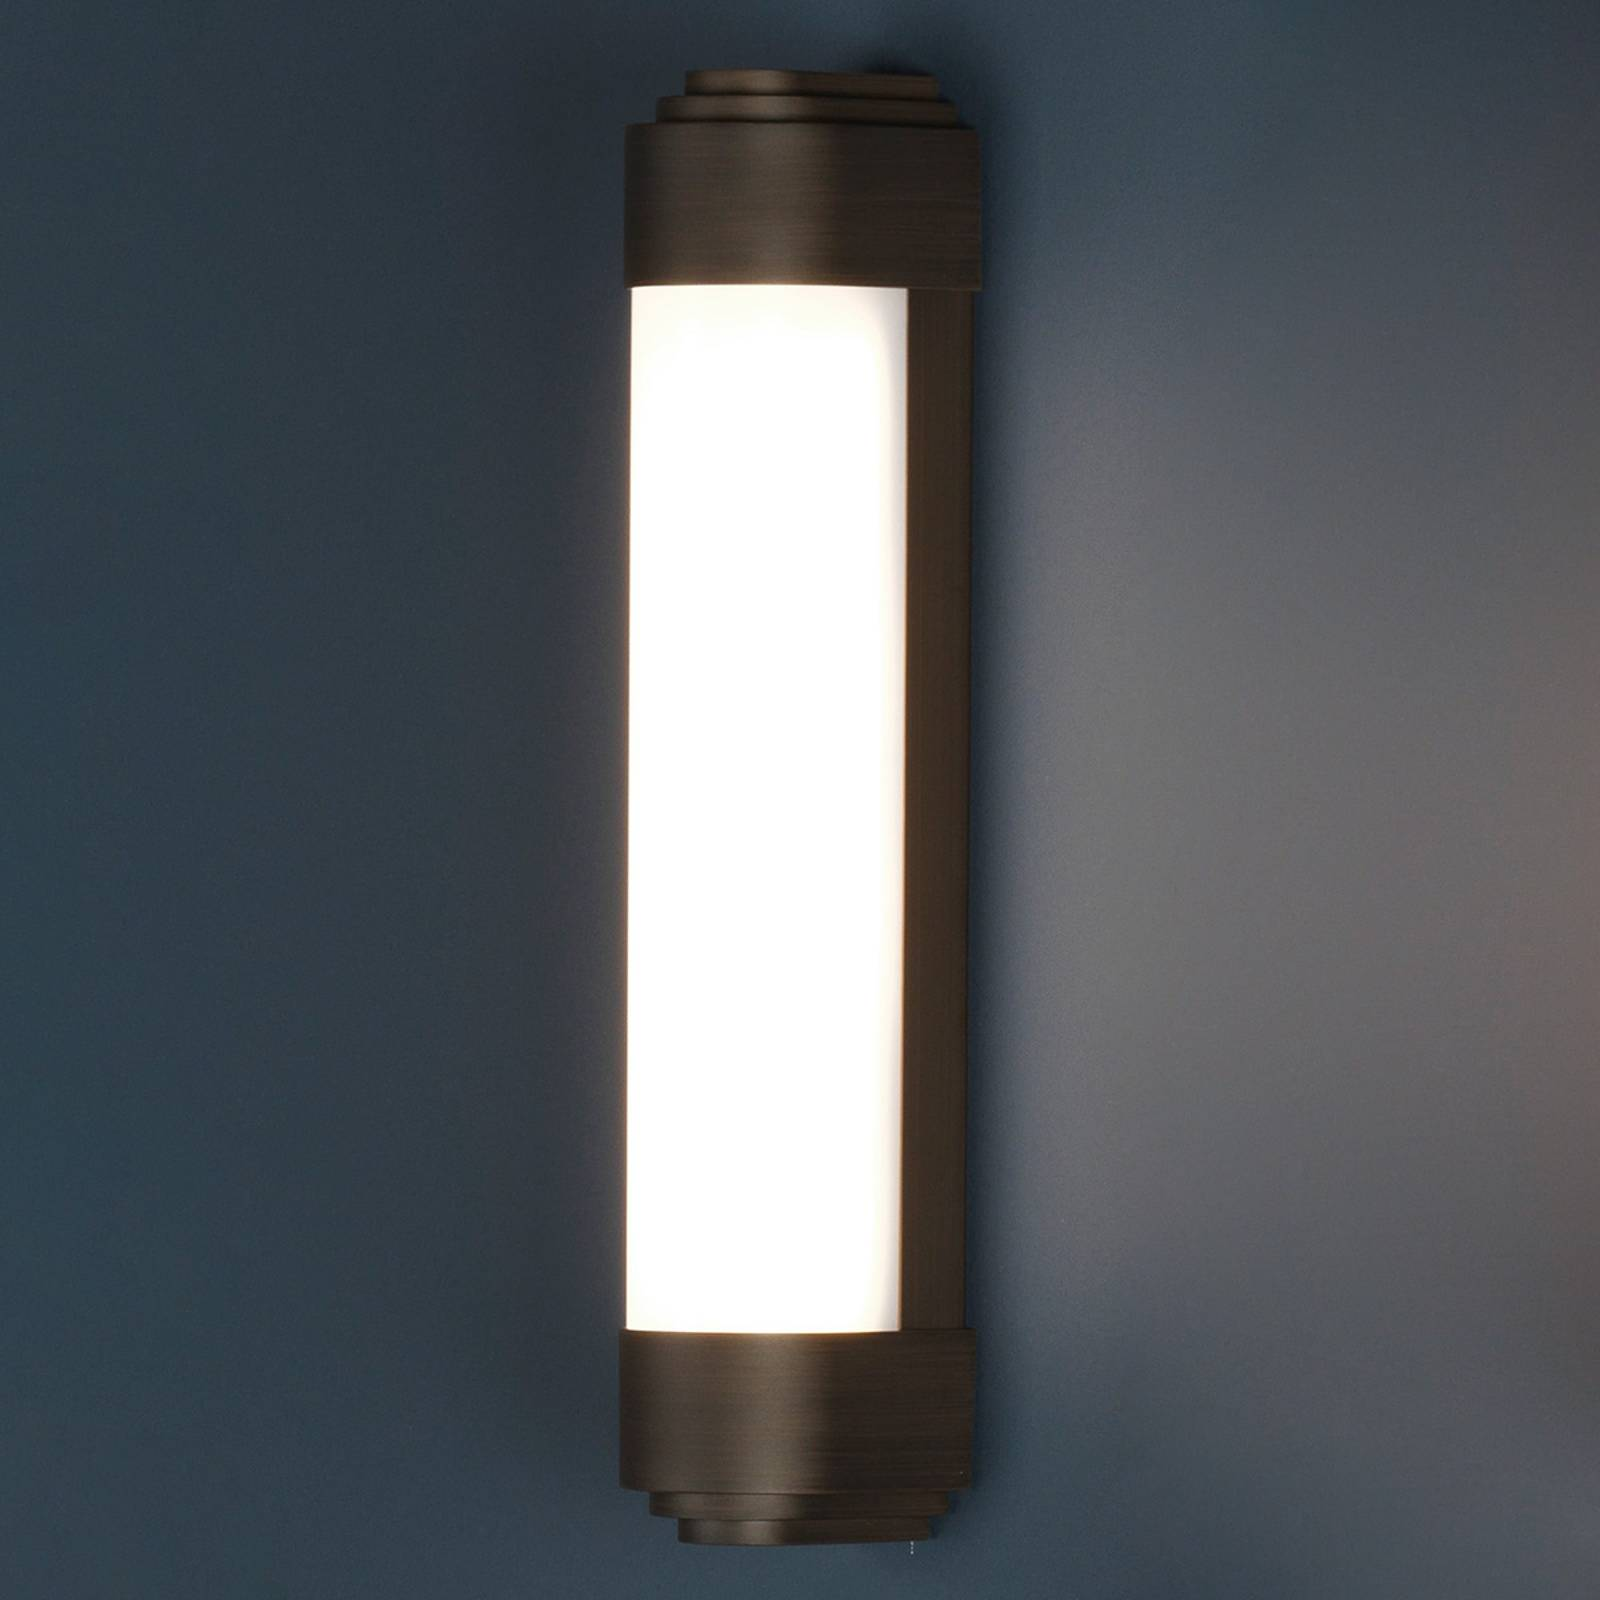 Astro Belgravia -LED-seinävalaisin, 40 cm